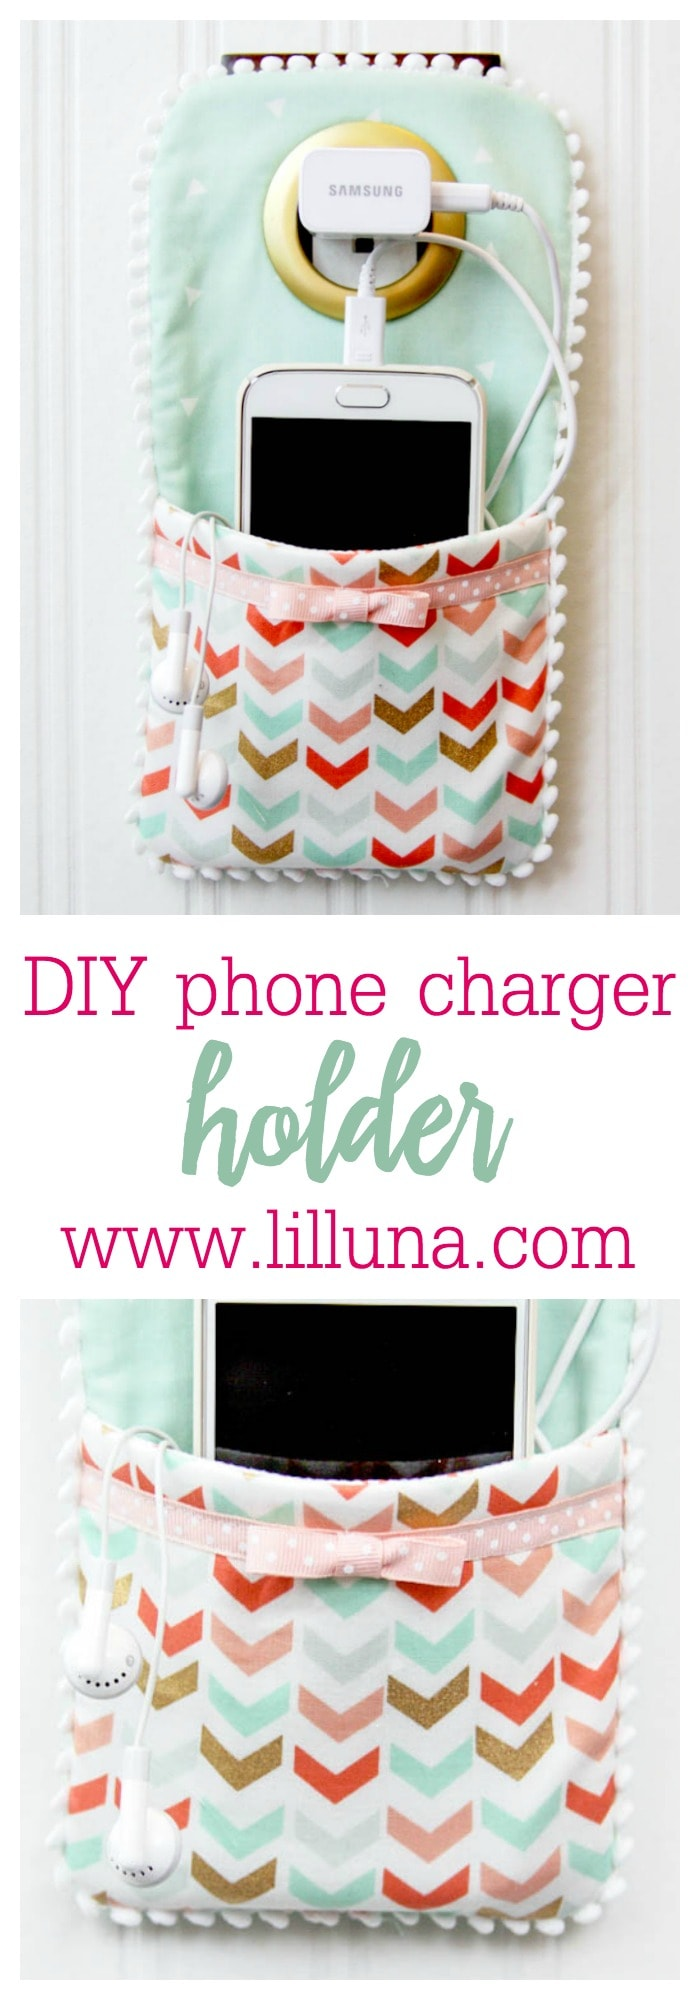 Diy Phone Charger Holder